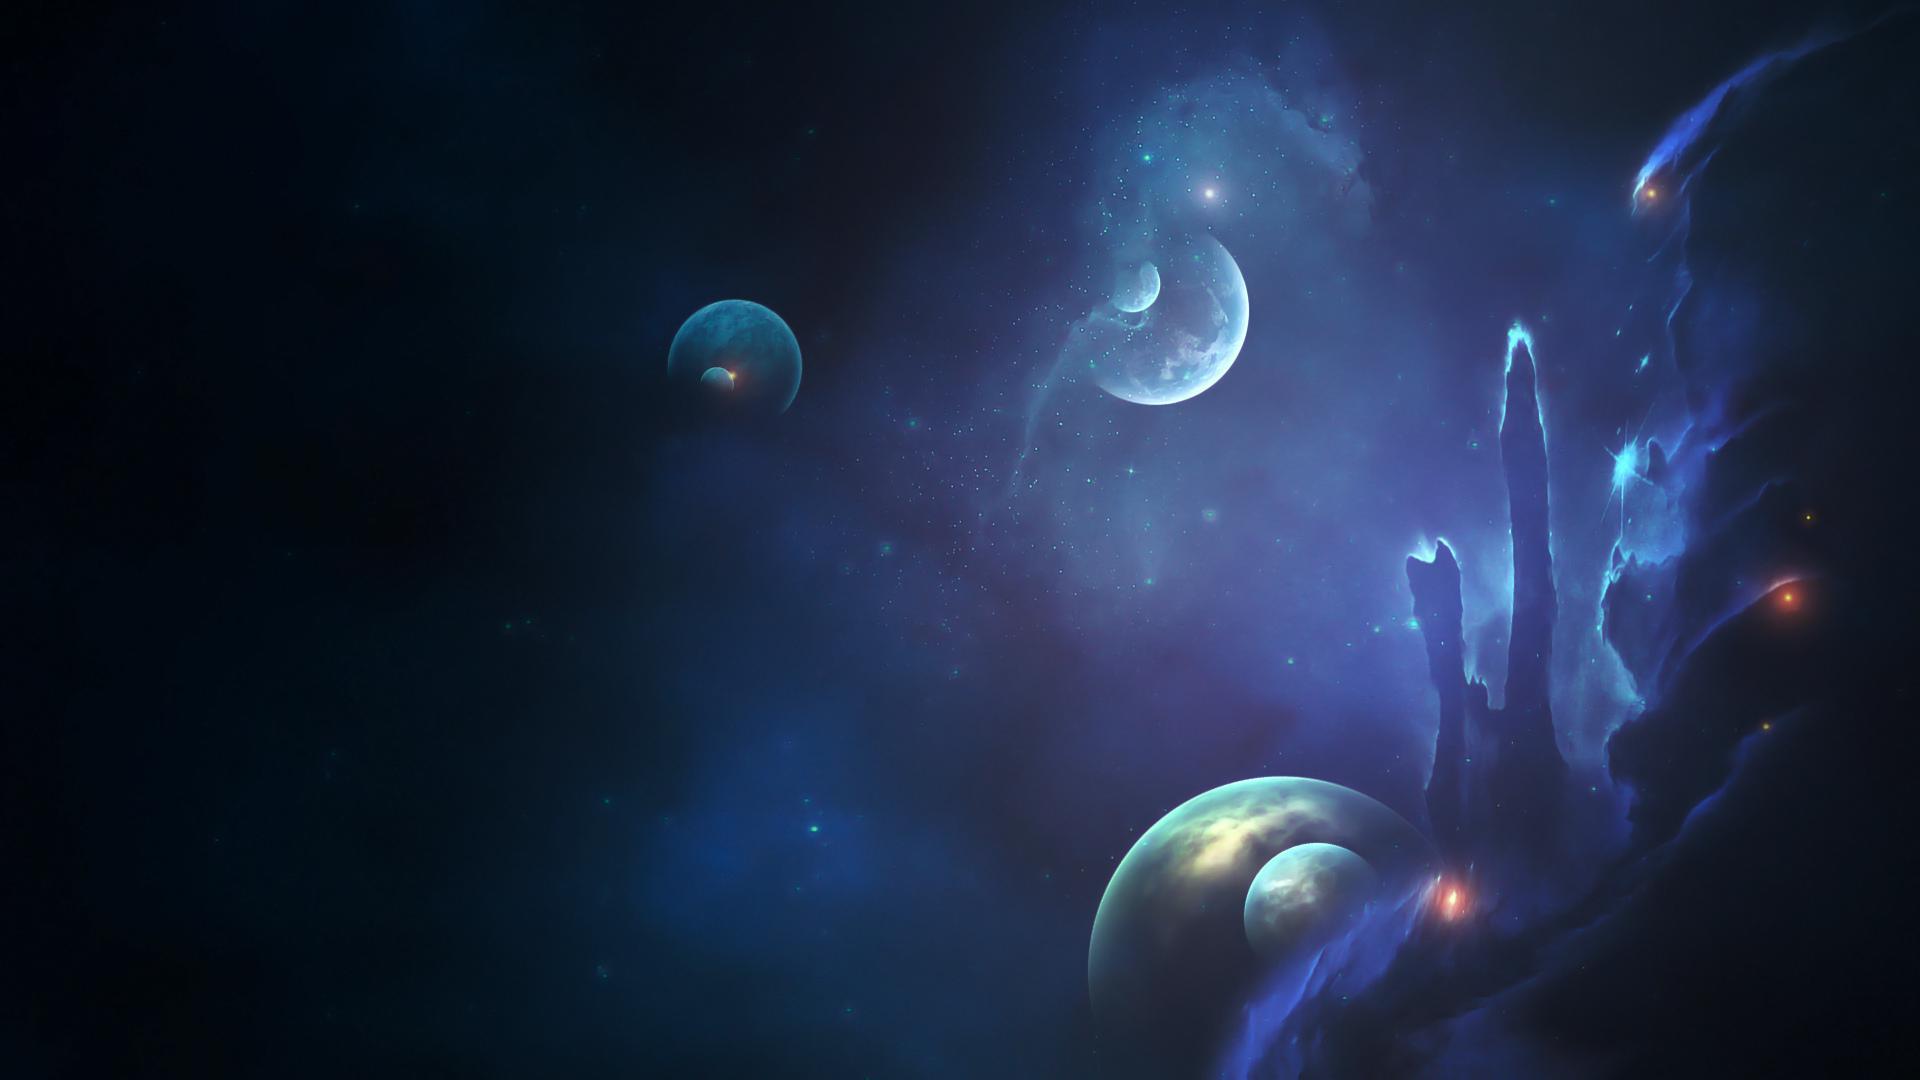 Space stars planets nebula wallpaper | 1920x1080 | 112933 ...